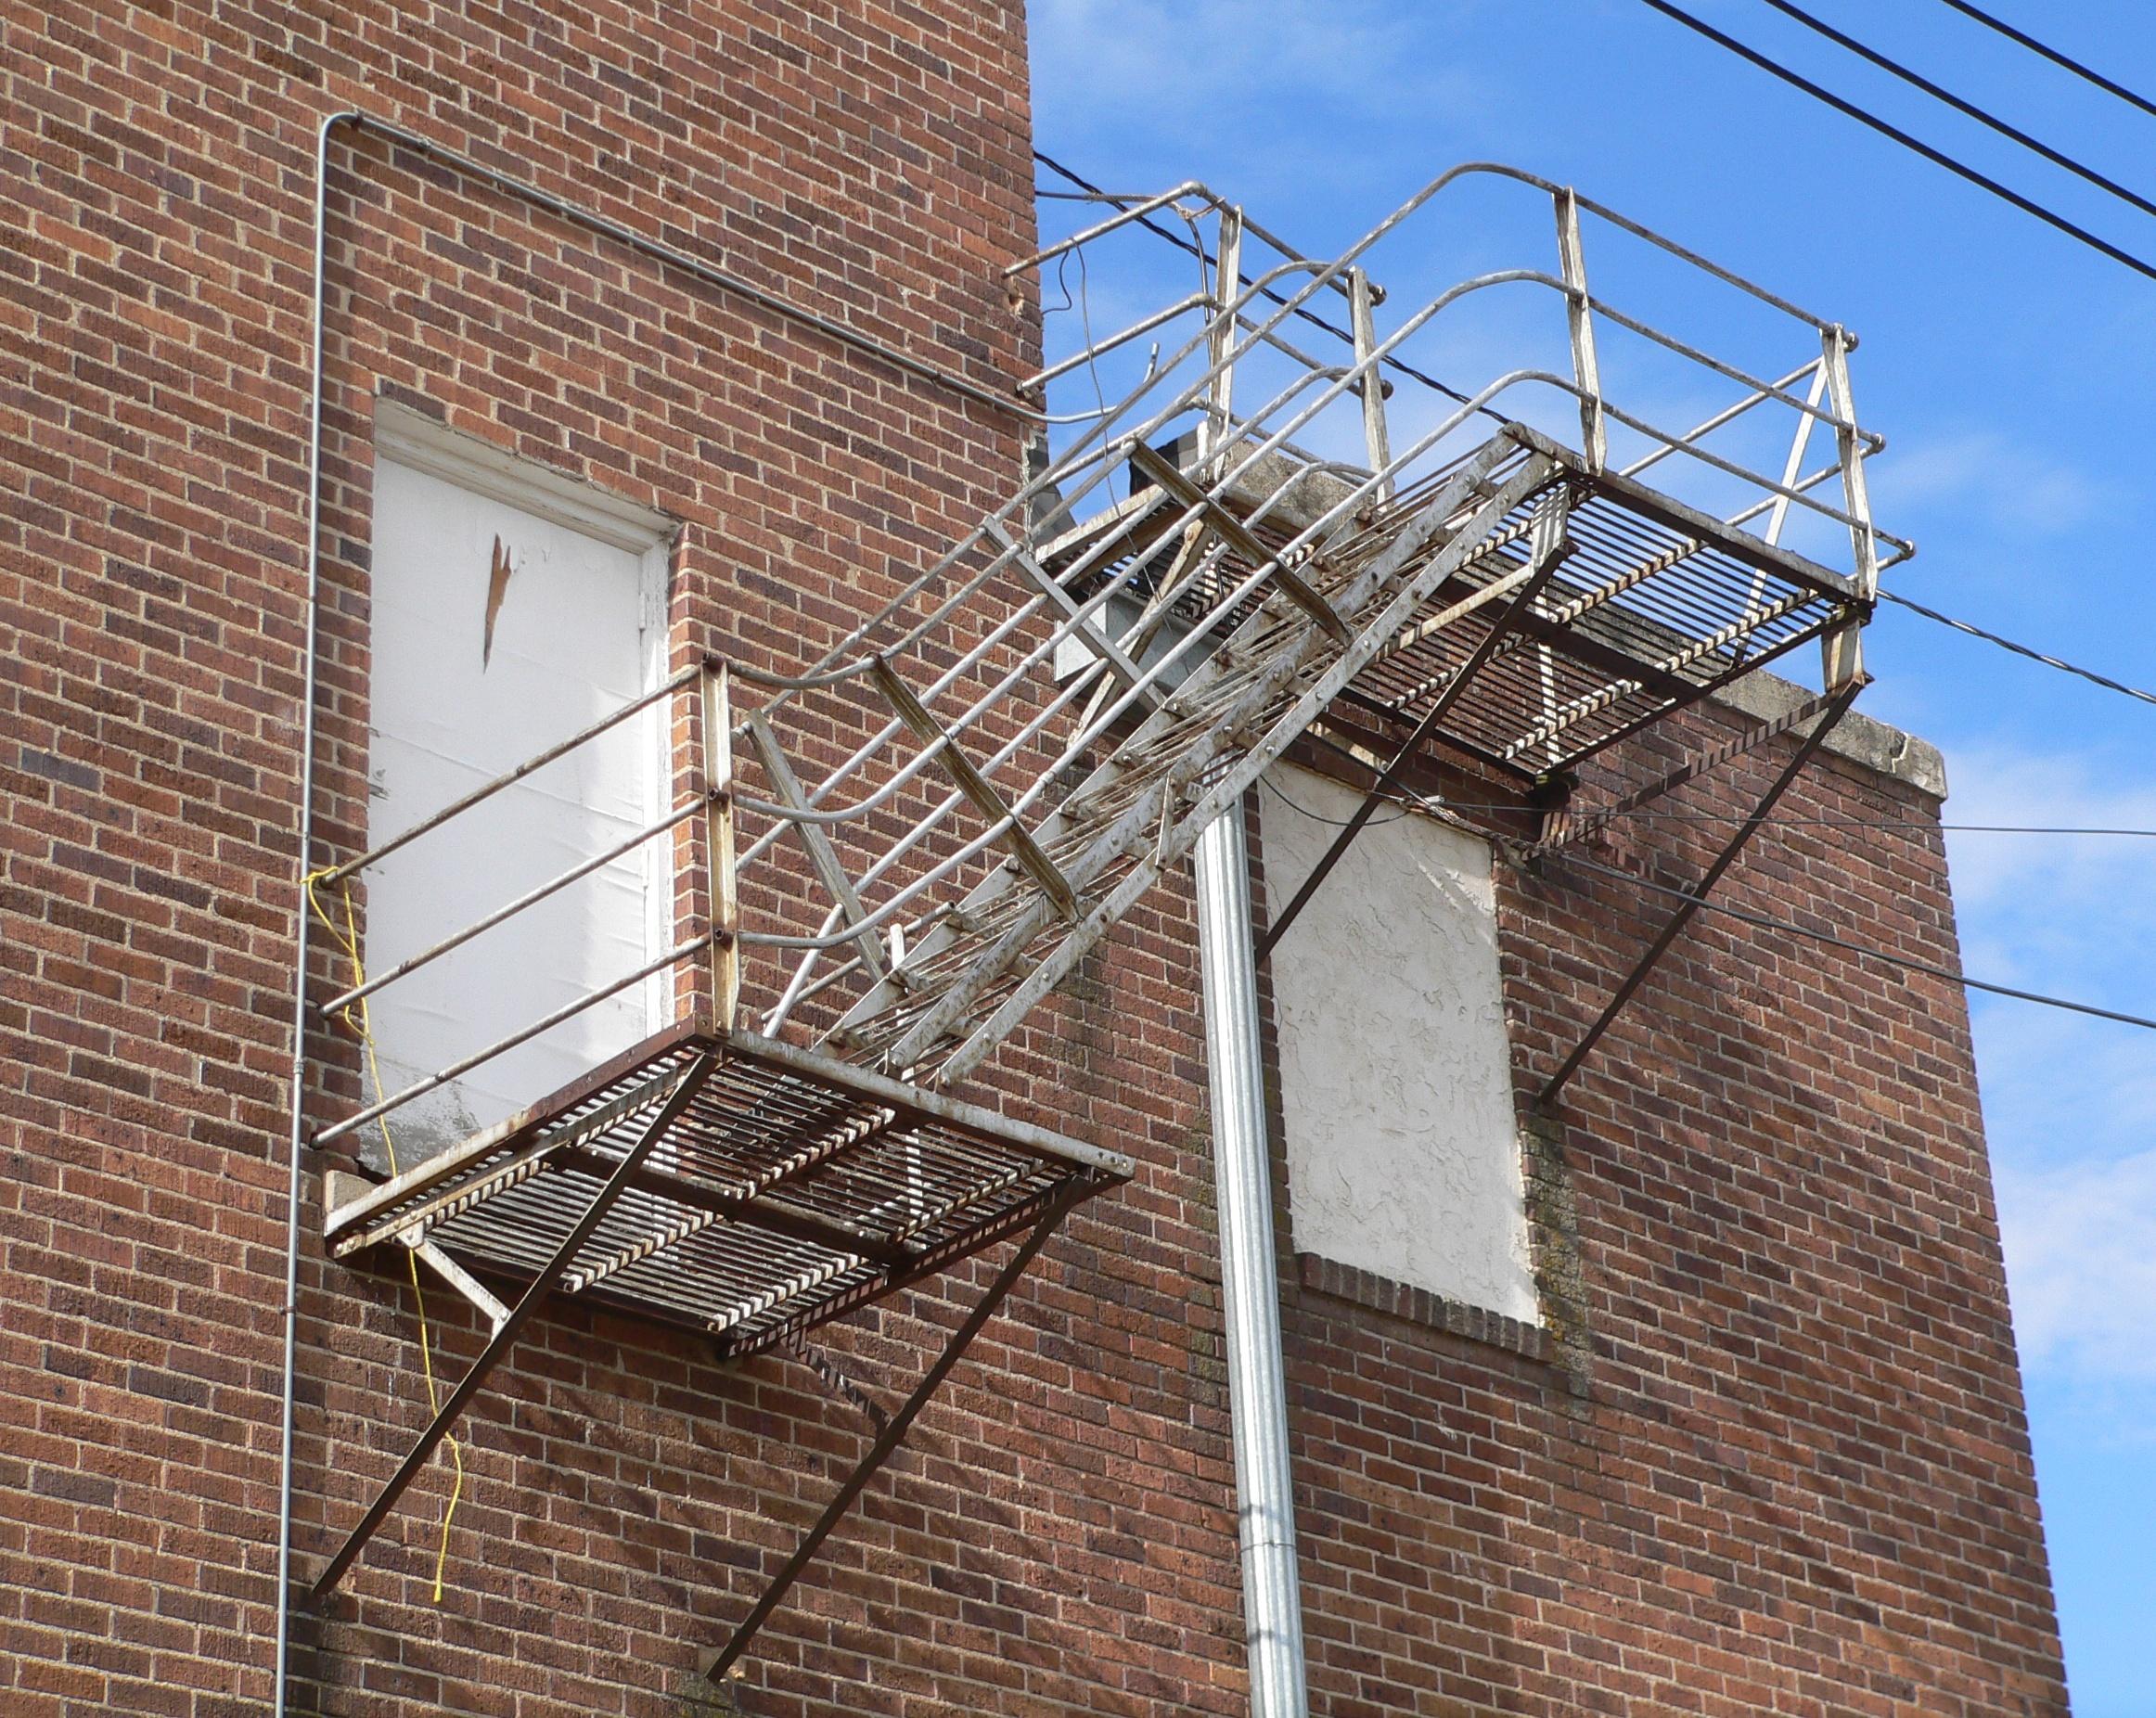 File:Hartington Auditorium E Side Exterior Stairs.JPG